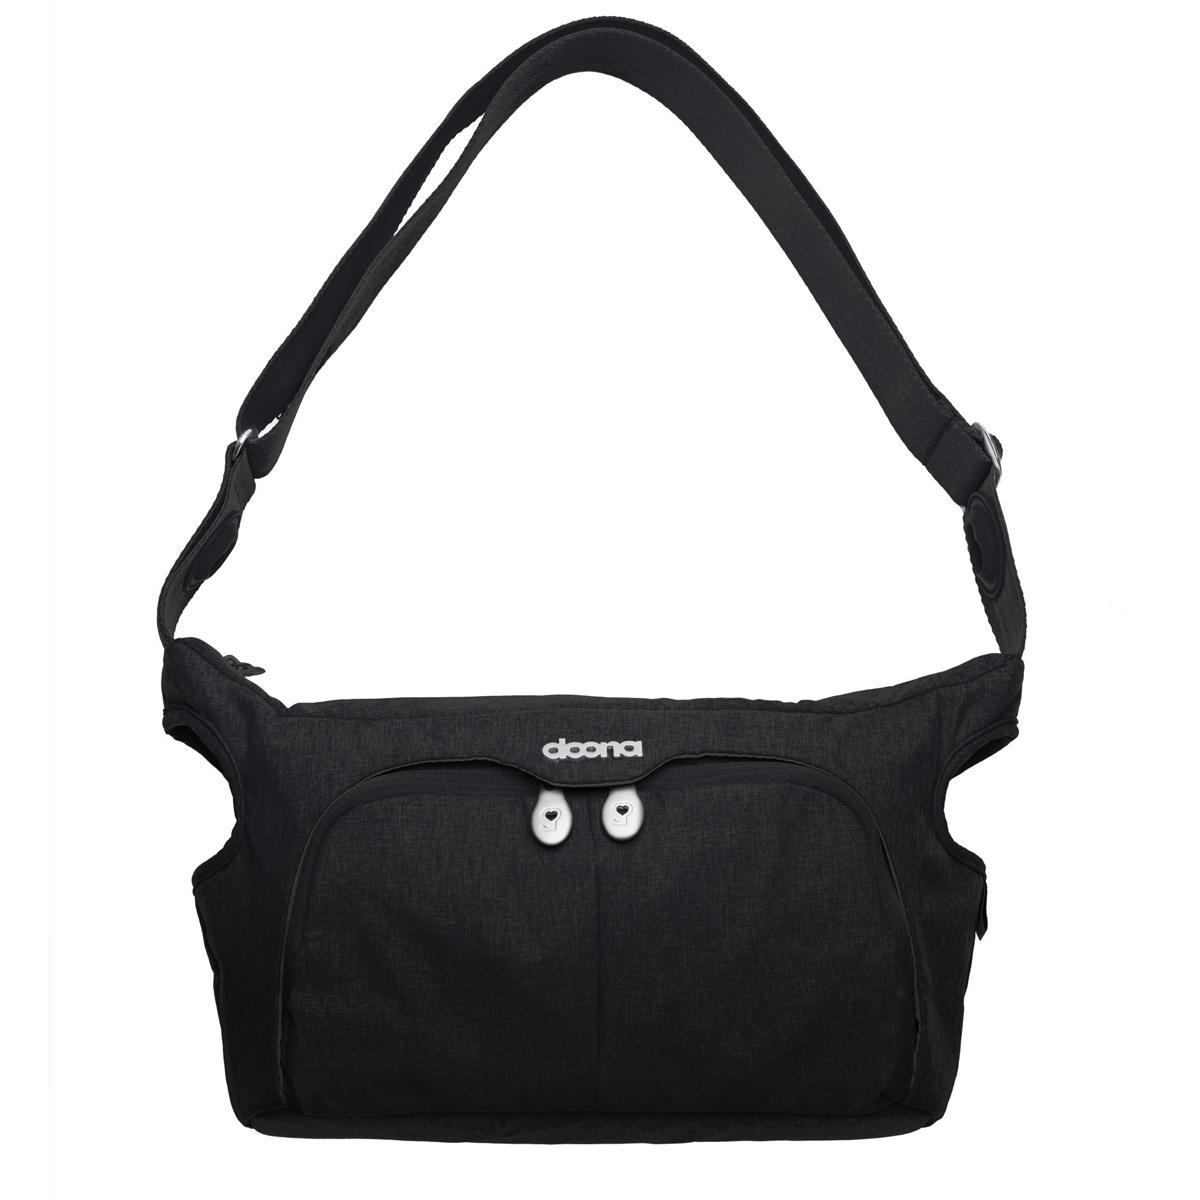 Sac à langer Sac à Langer Essential Bag - Noir Sac à Langer Essential Bag - Noir